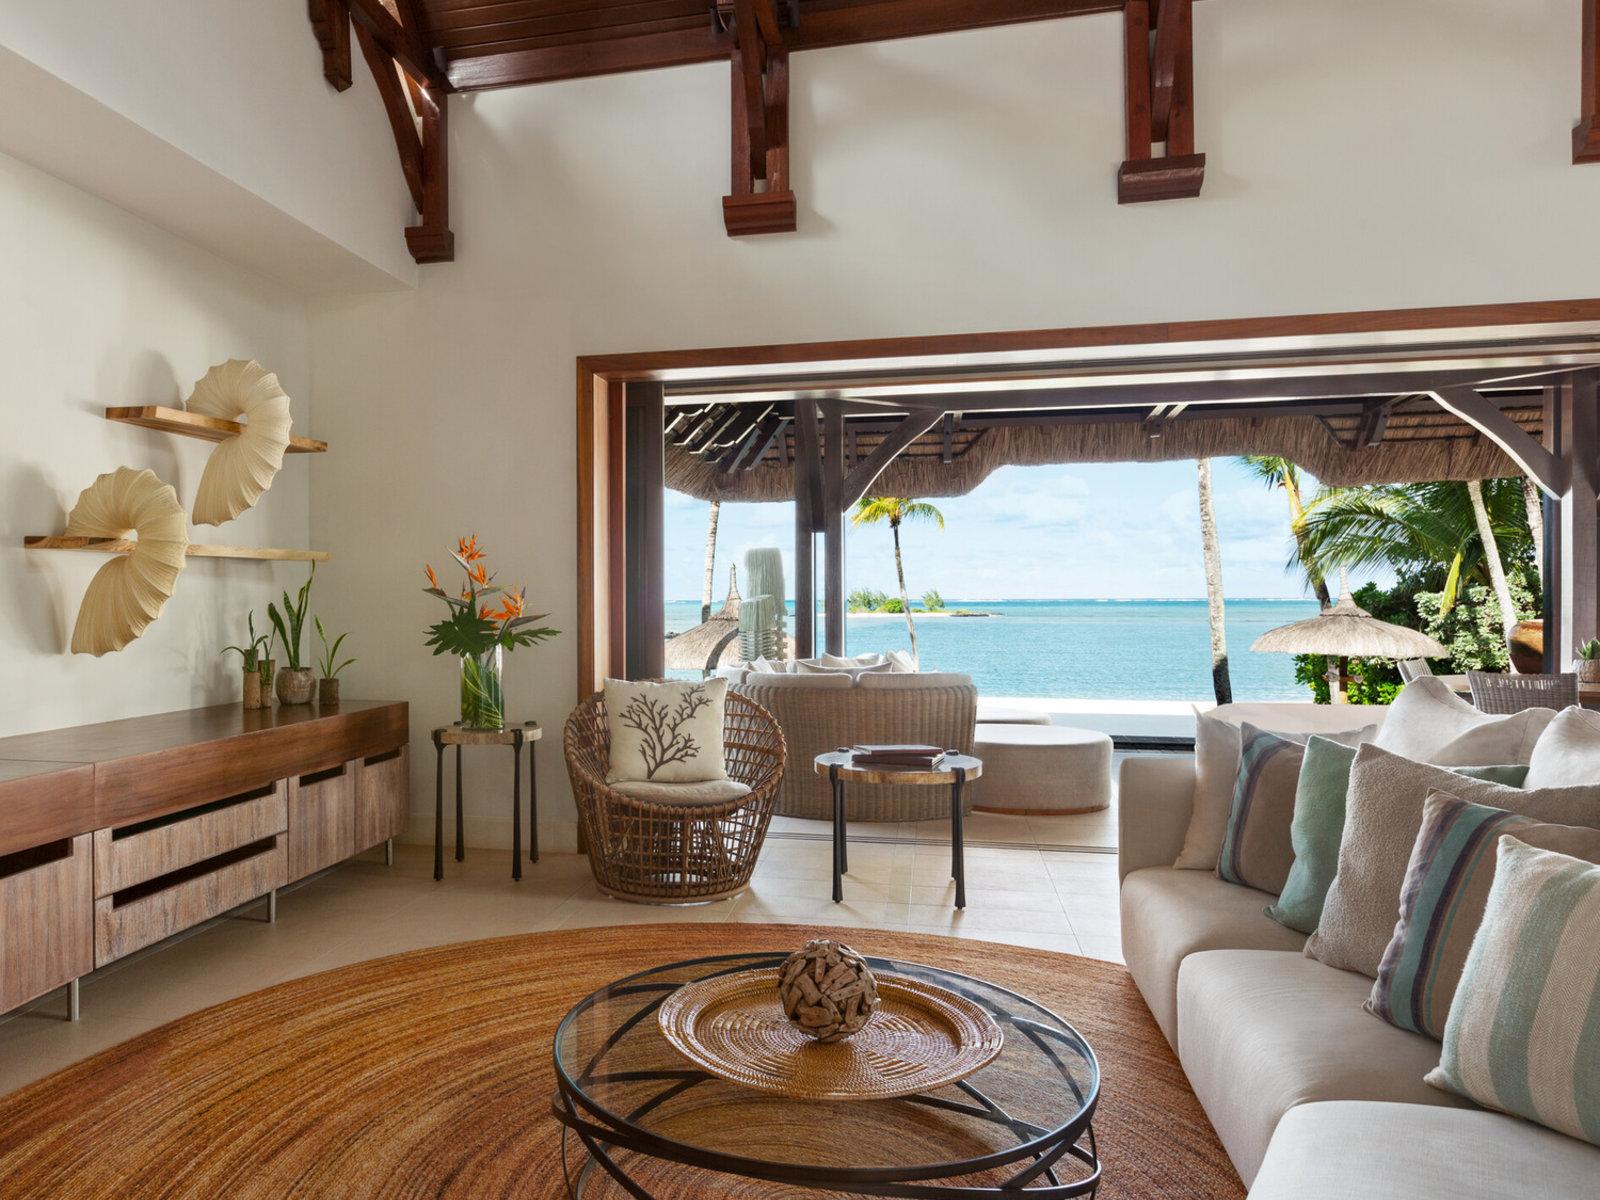 Wohnbeispiel Shangri-La Three Bedroom Beach Villa